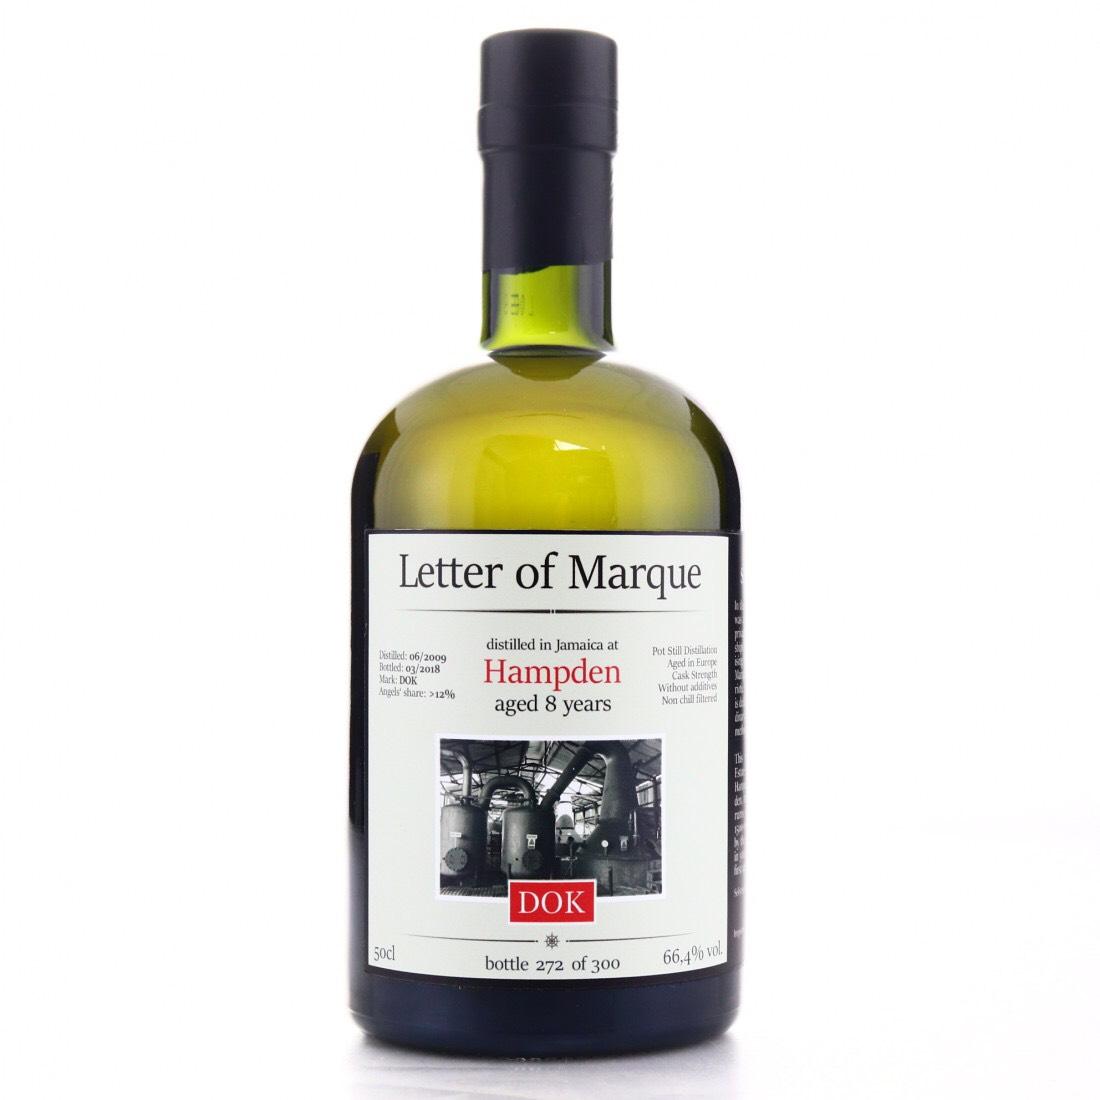 Bottle image of Letter of Marque DOK